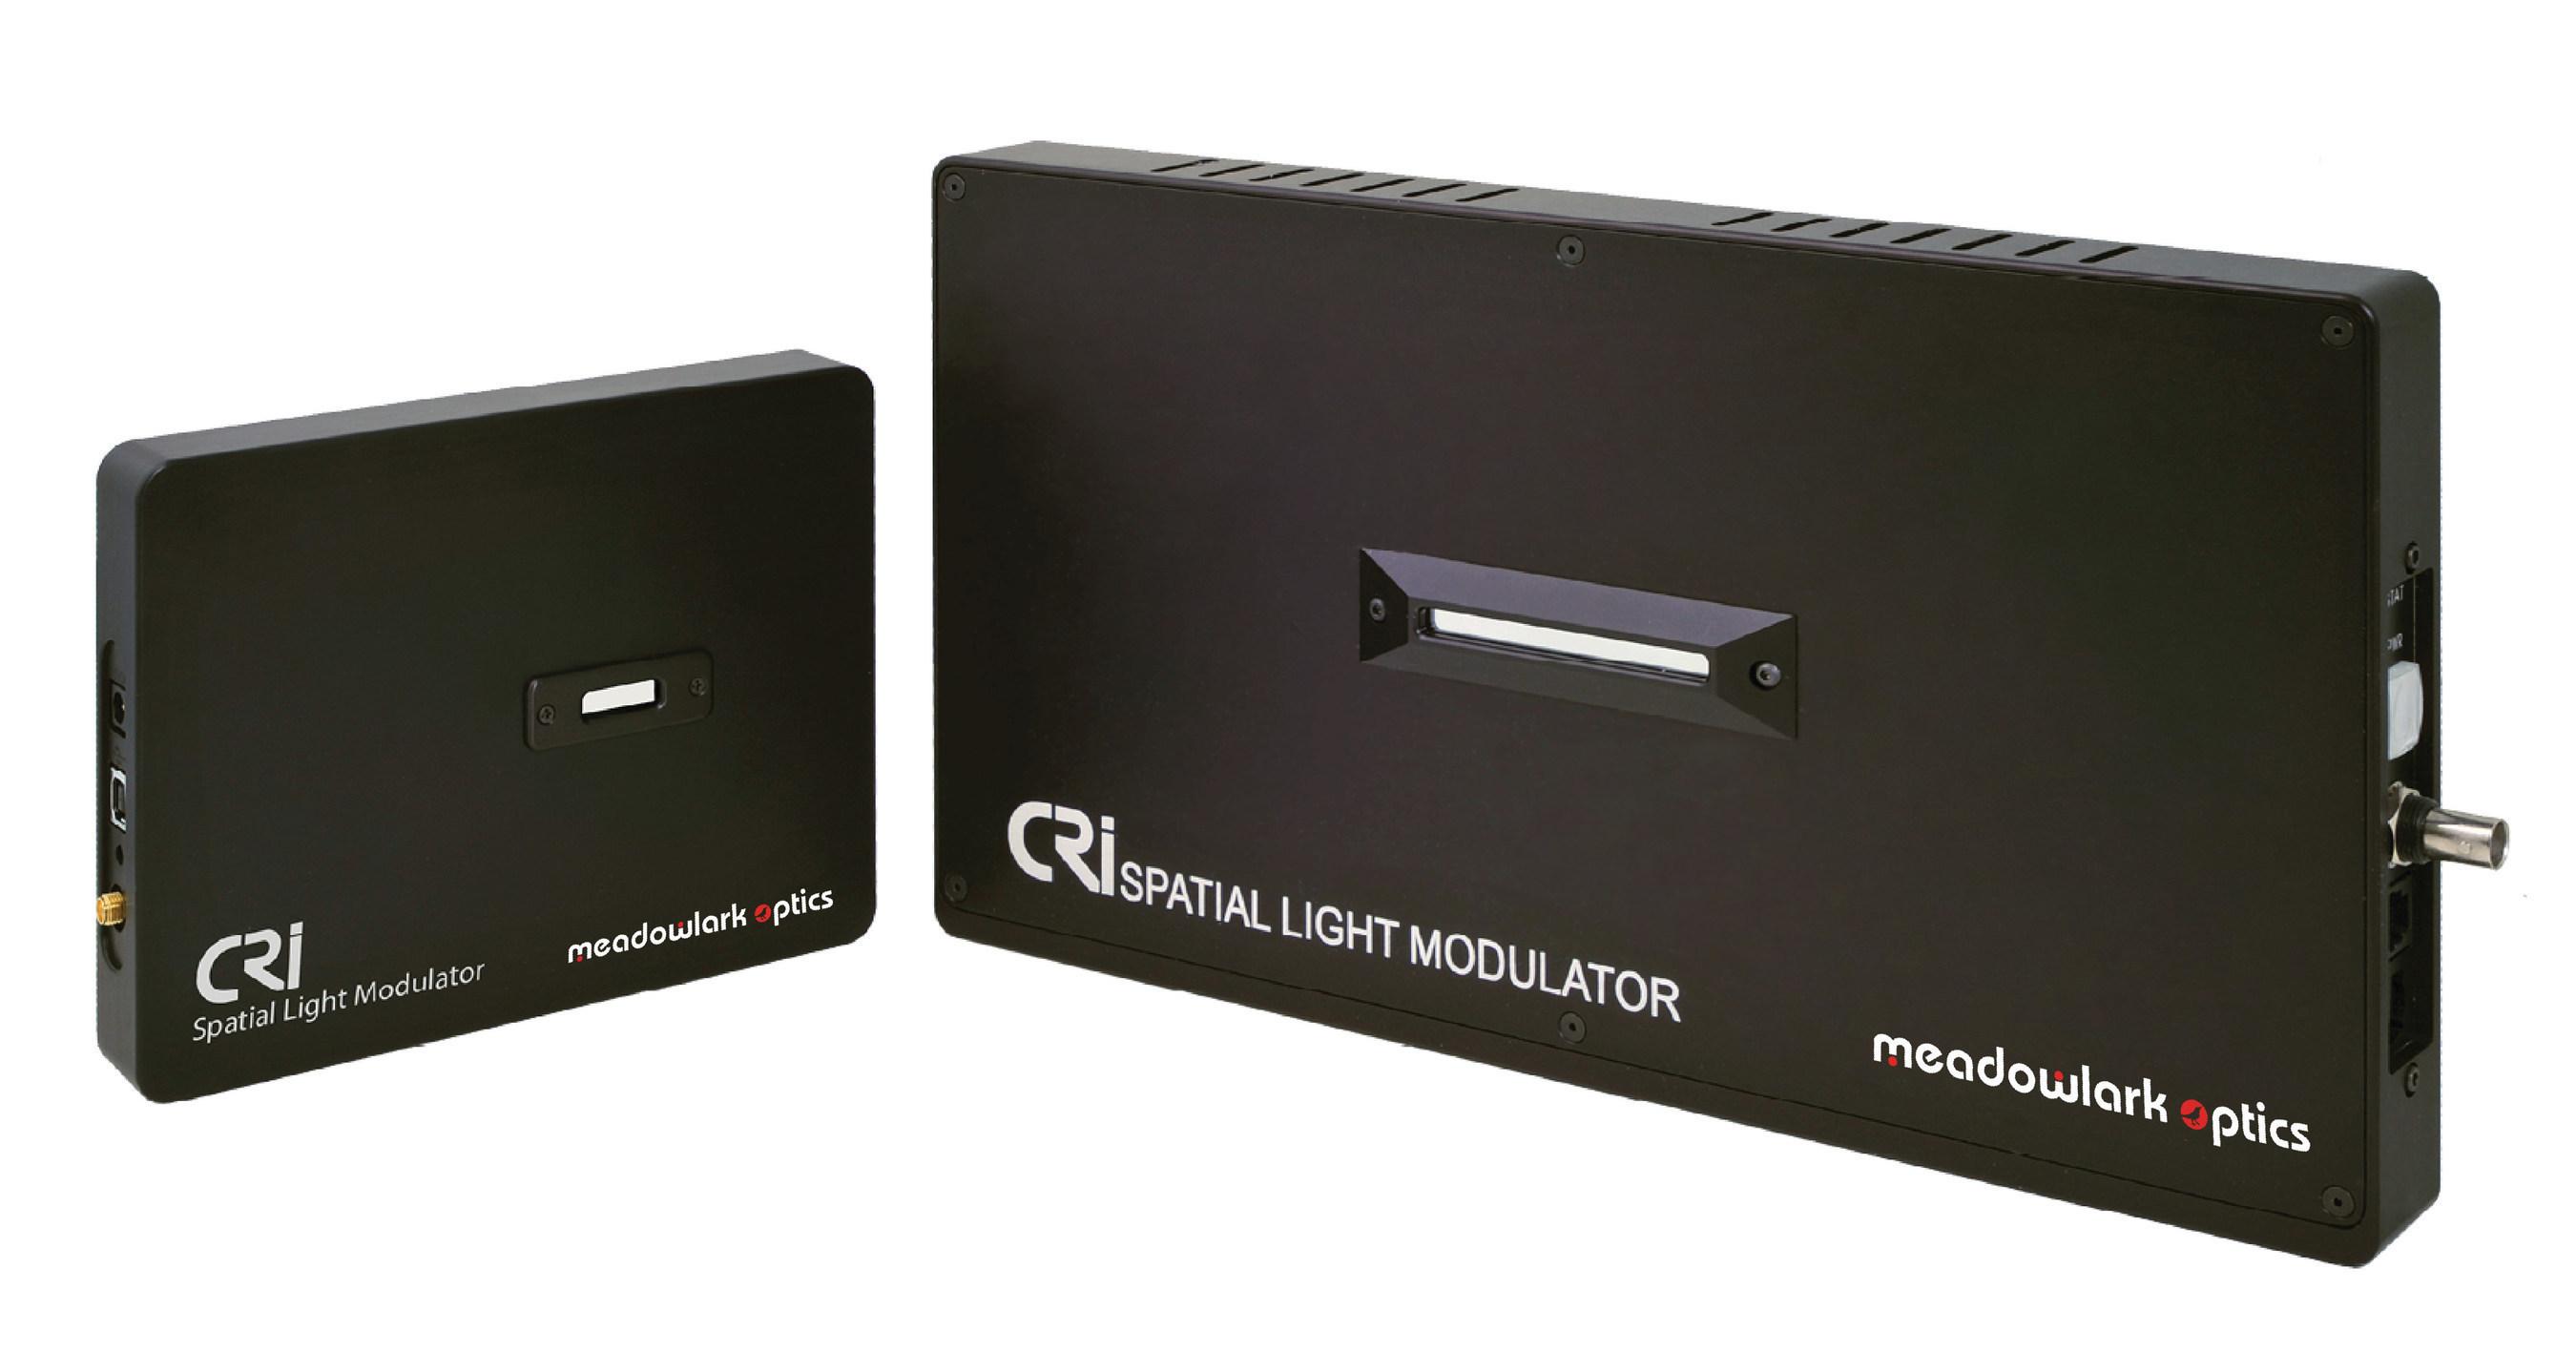 Meadowlark Optics Announces Acquisition of CRi Spatial Light Modulator Product Line